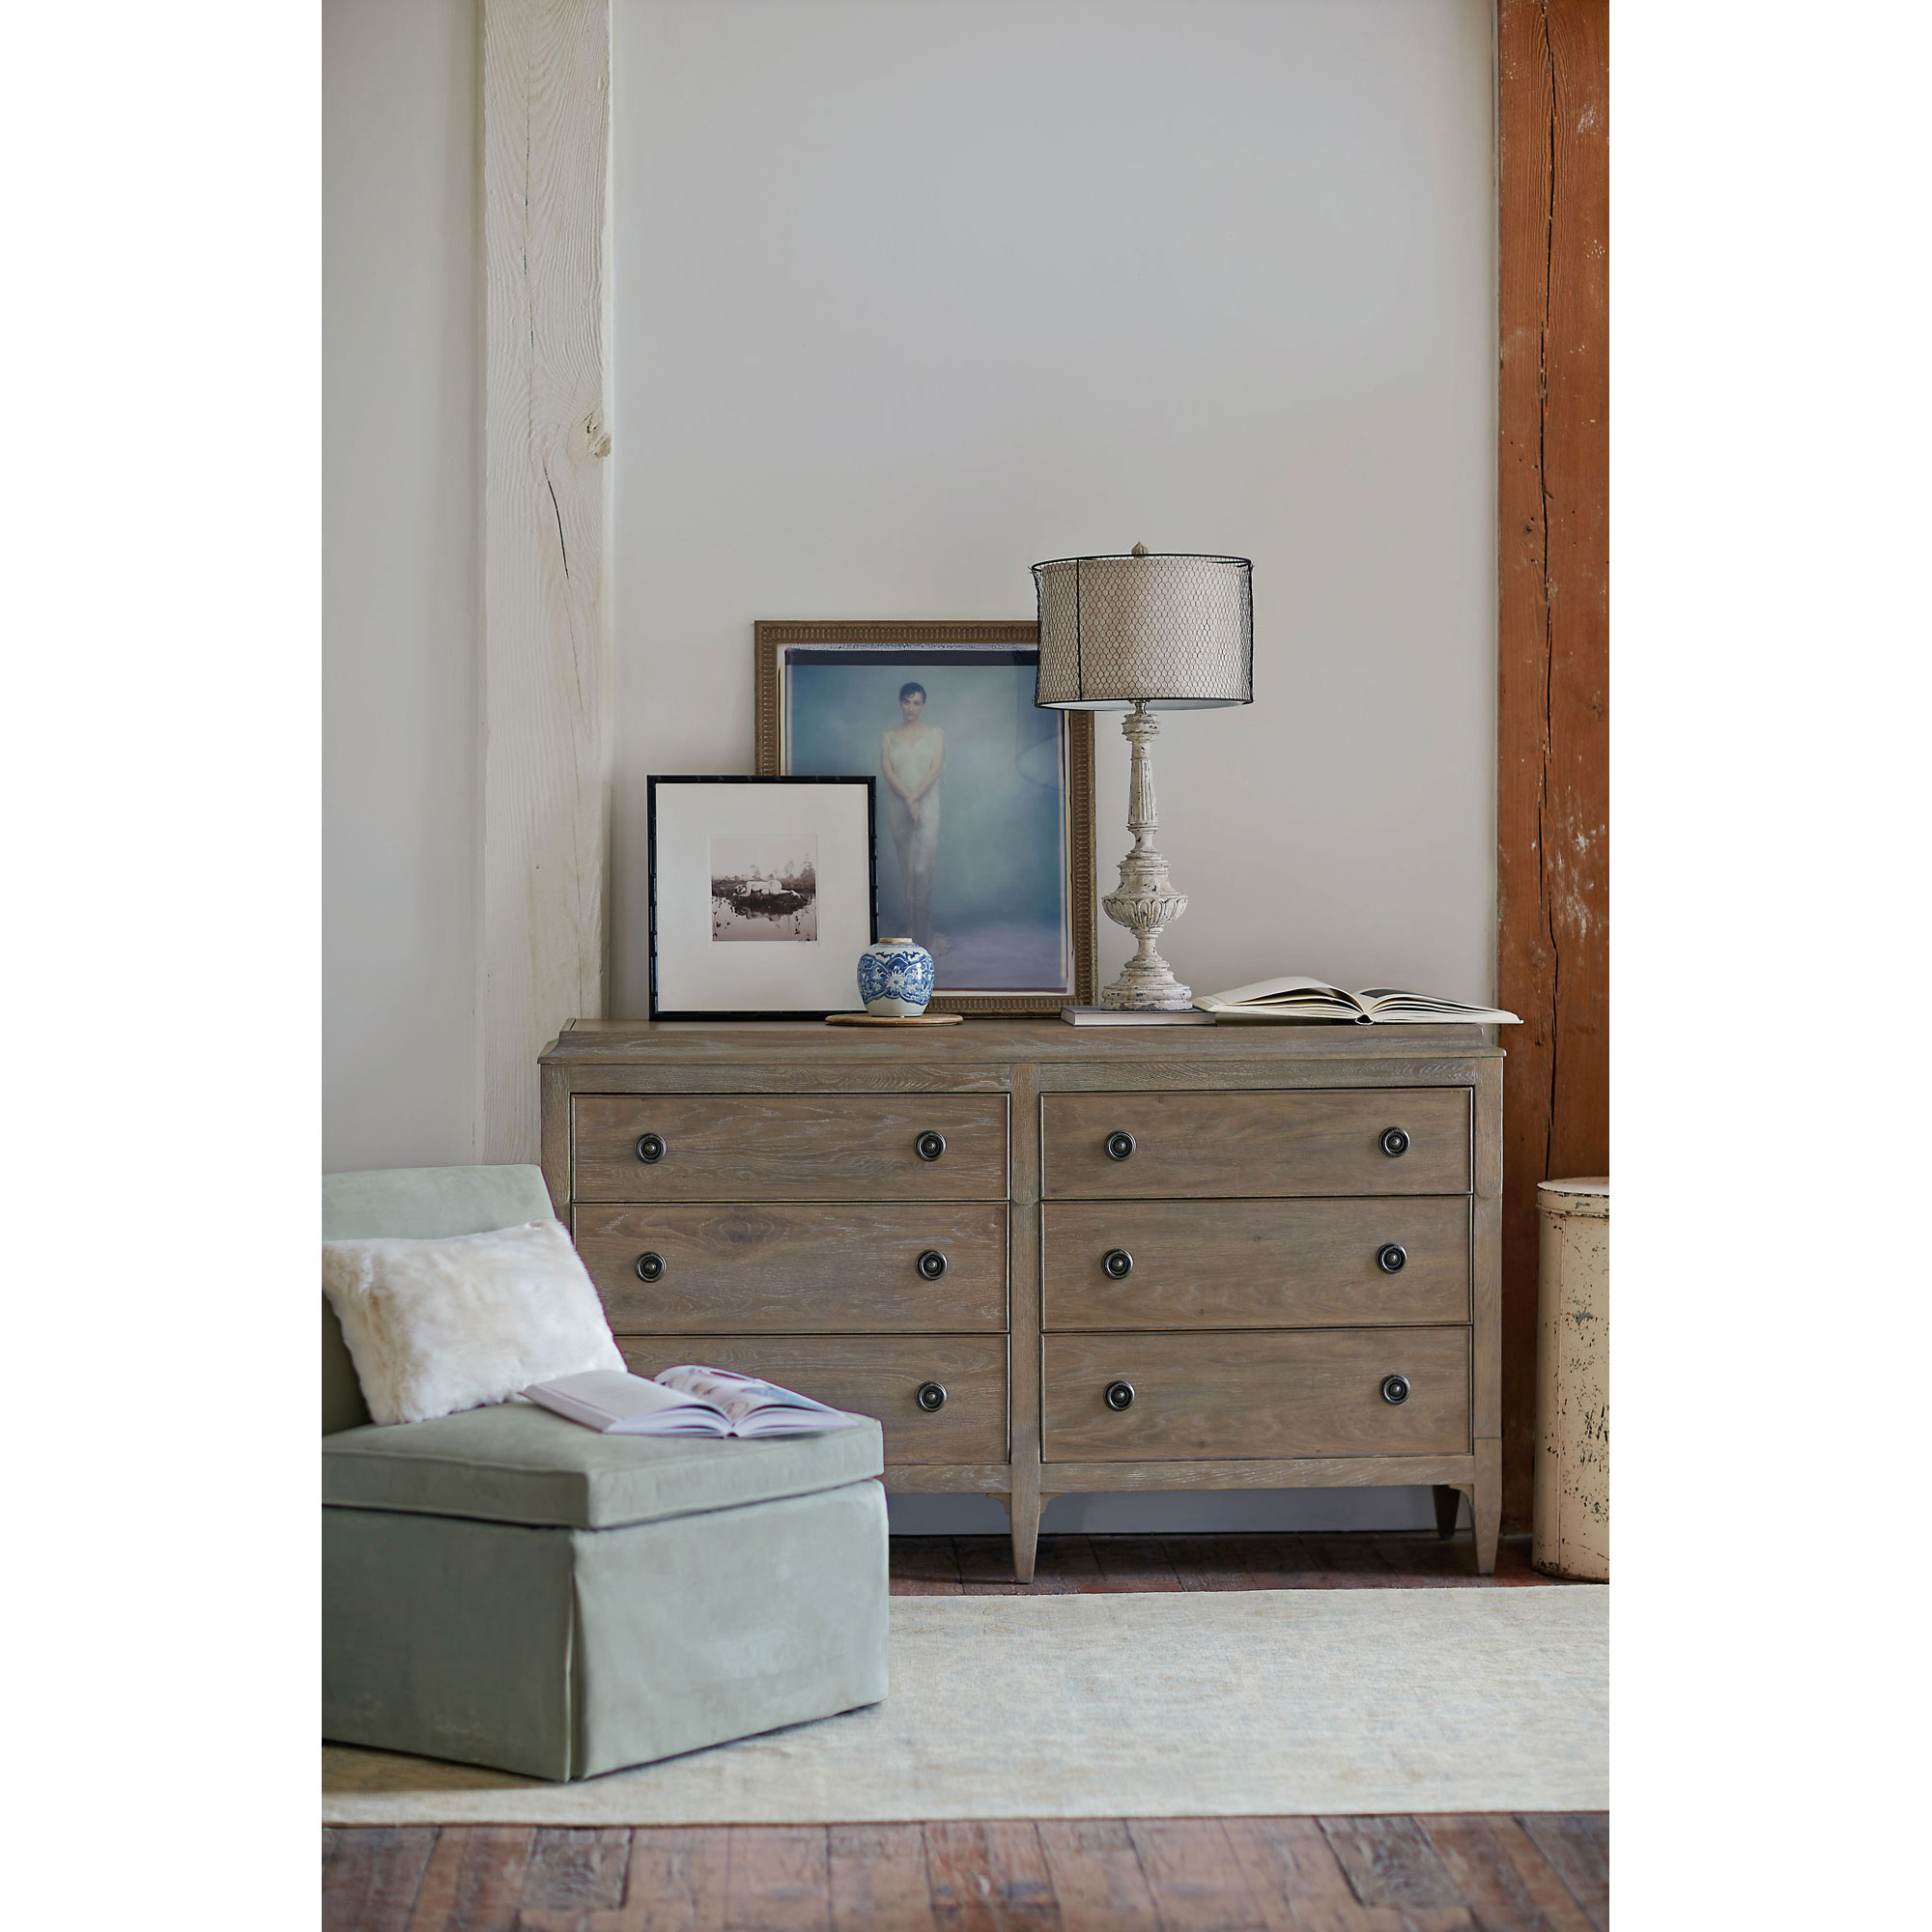 Marietta French Country Antique Oak Curved 6 Drawer Dresser